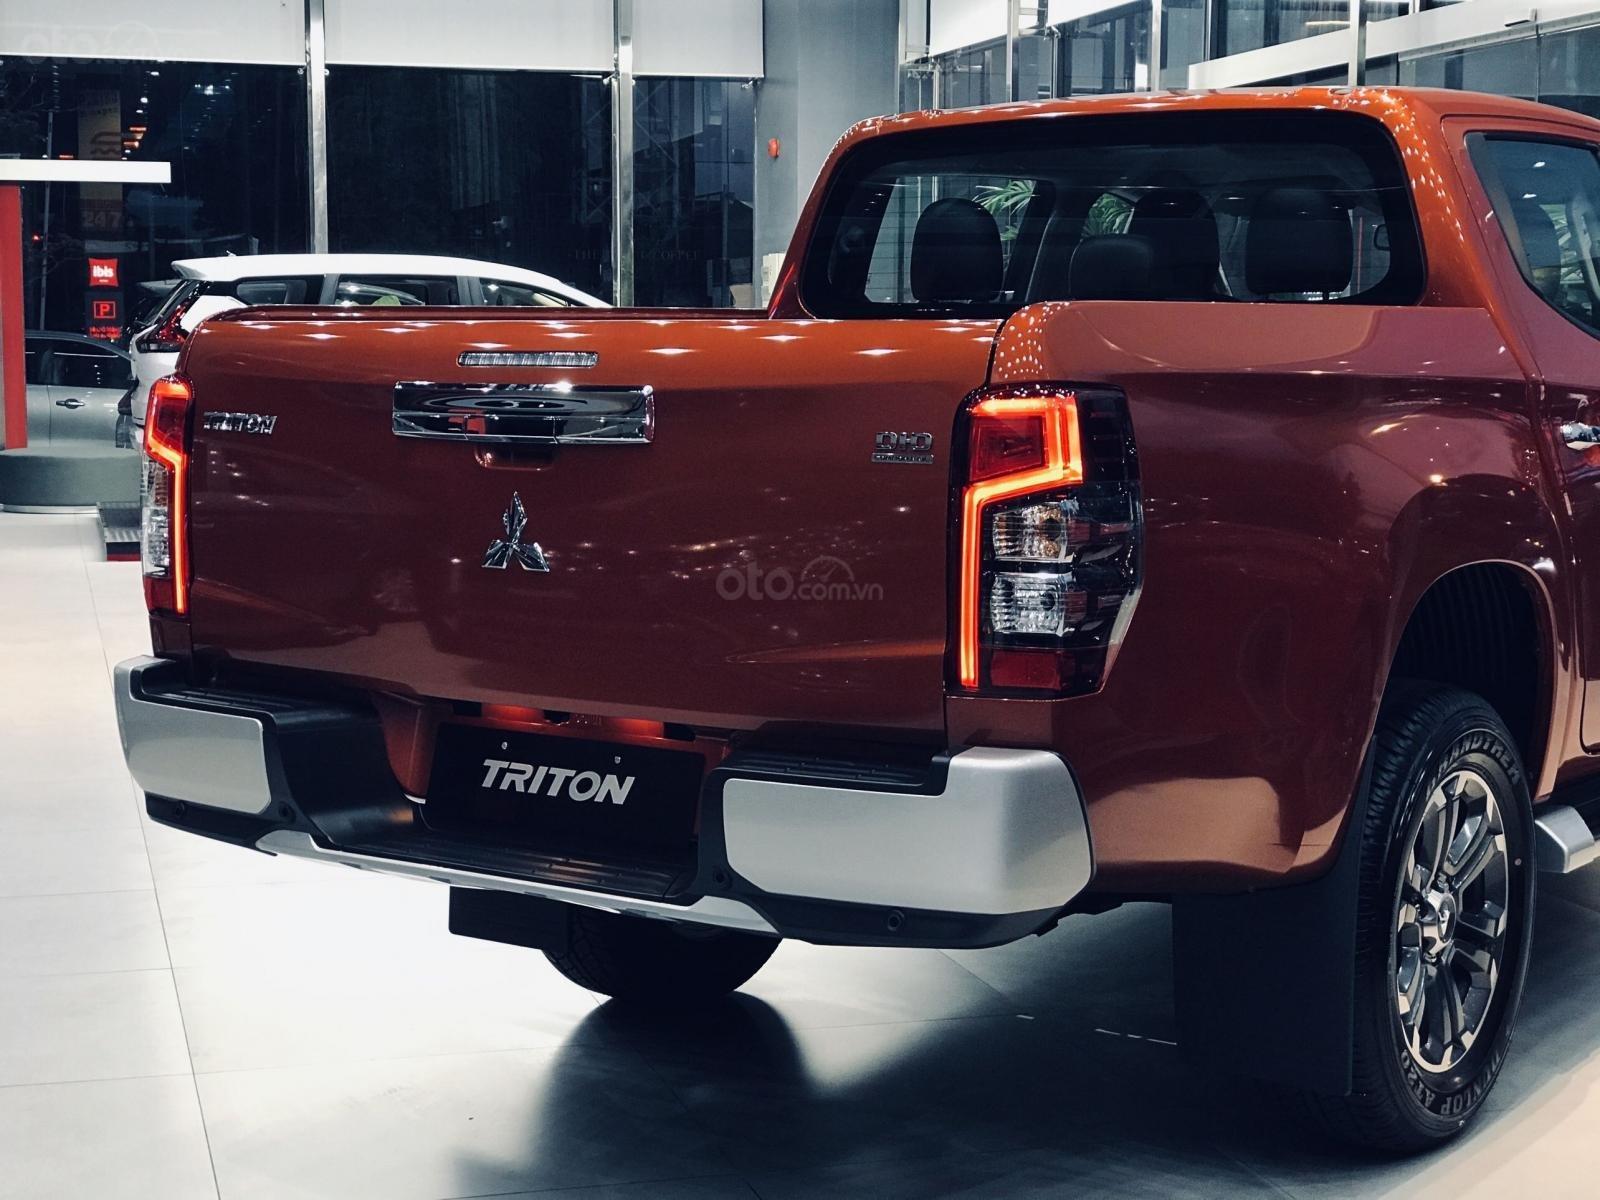 Triton AT new 2021 giá 630 triệu (4)